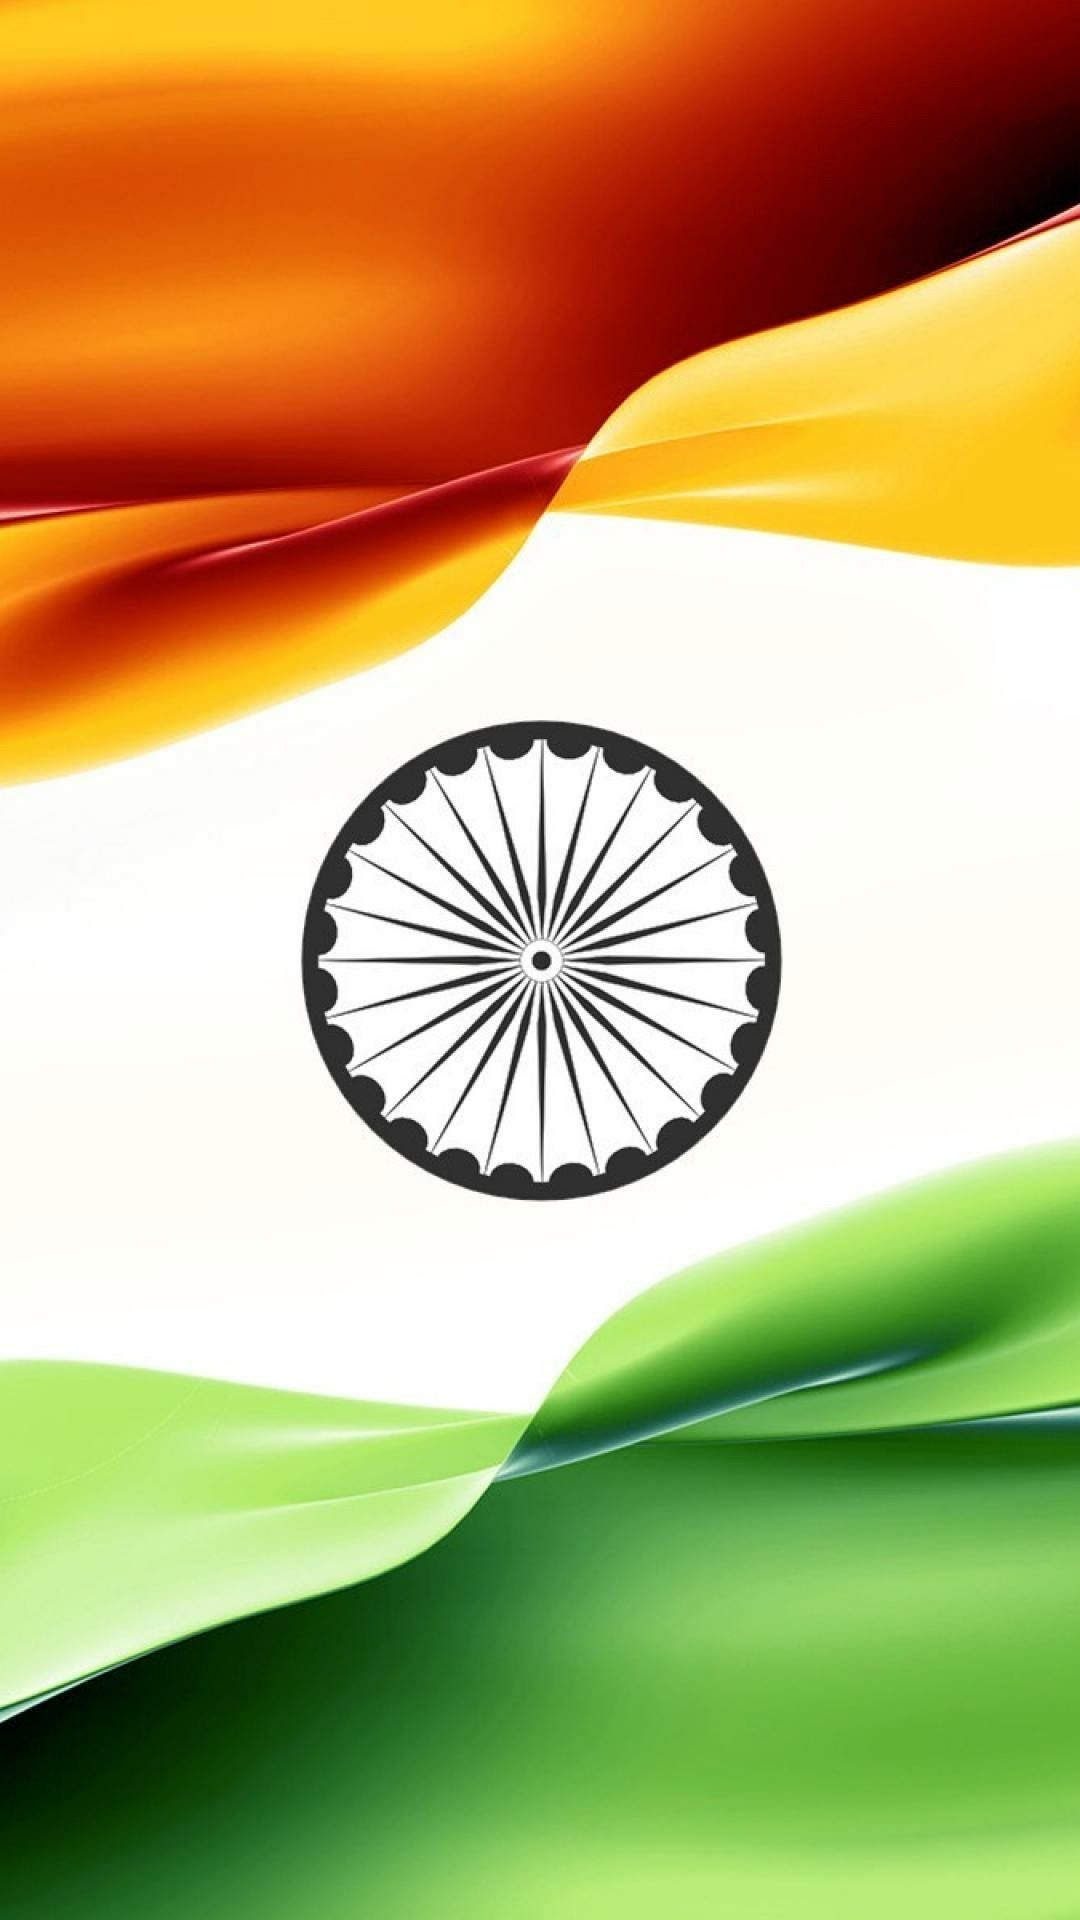 Indian Flag Indian Flag Wallpaper Indian Flag Indian Flag Images